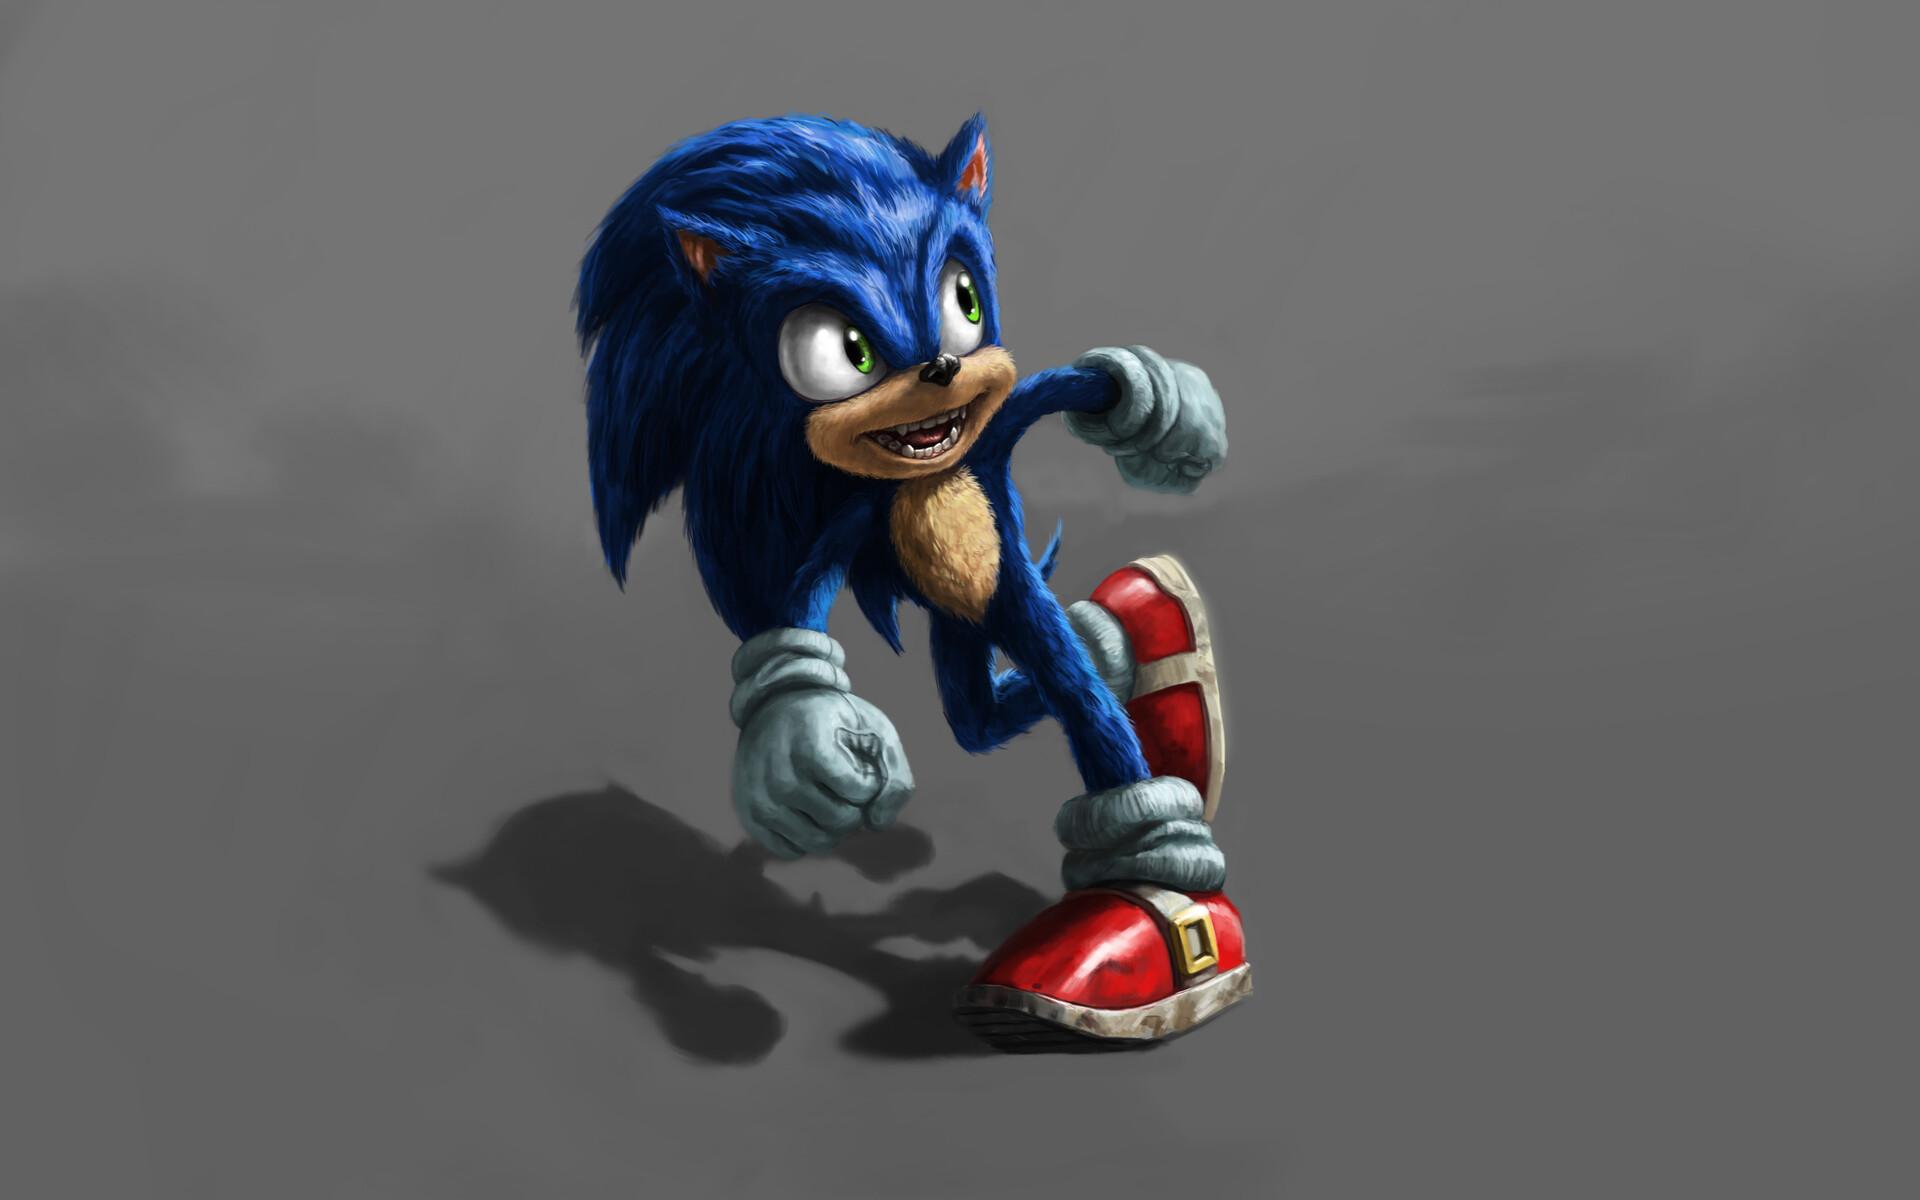 Sonic Live Action Concept Cartoon 560741 Hd Wallpaper